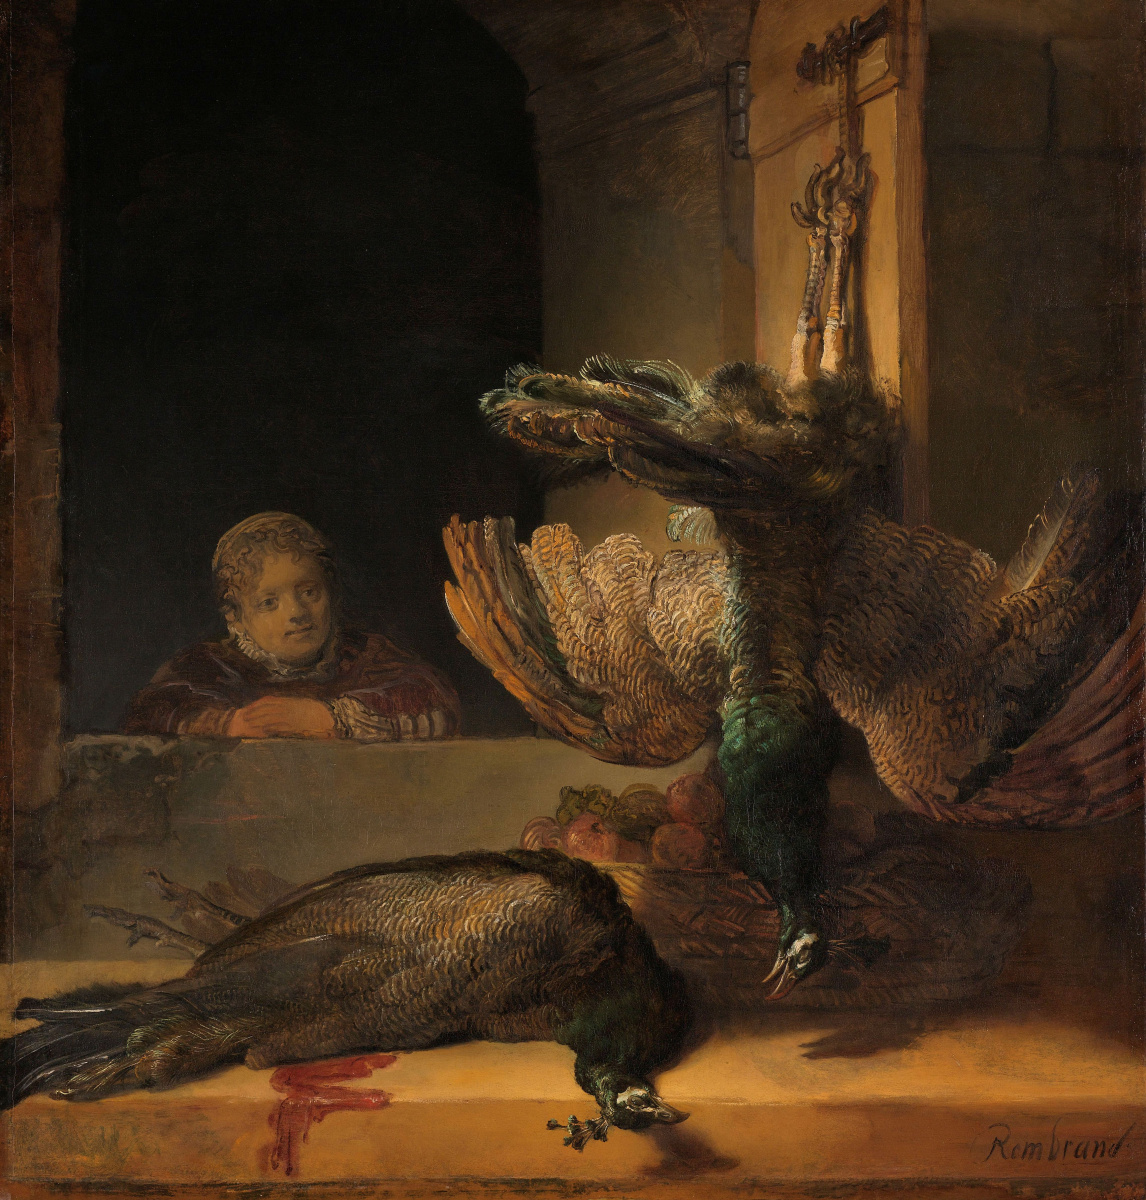 Рембрандт Харменс ван Рейн. Натюрморт с двумя мёртвыми павлинами